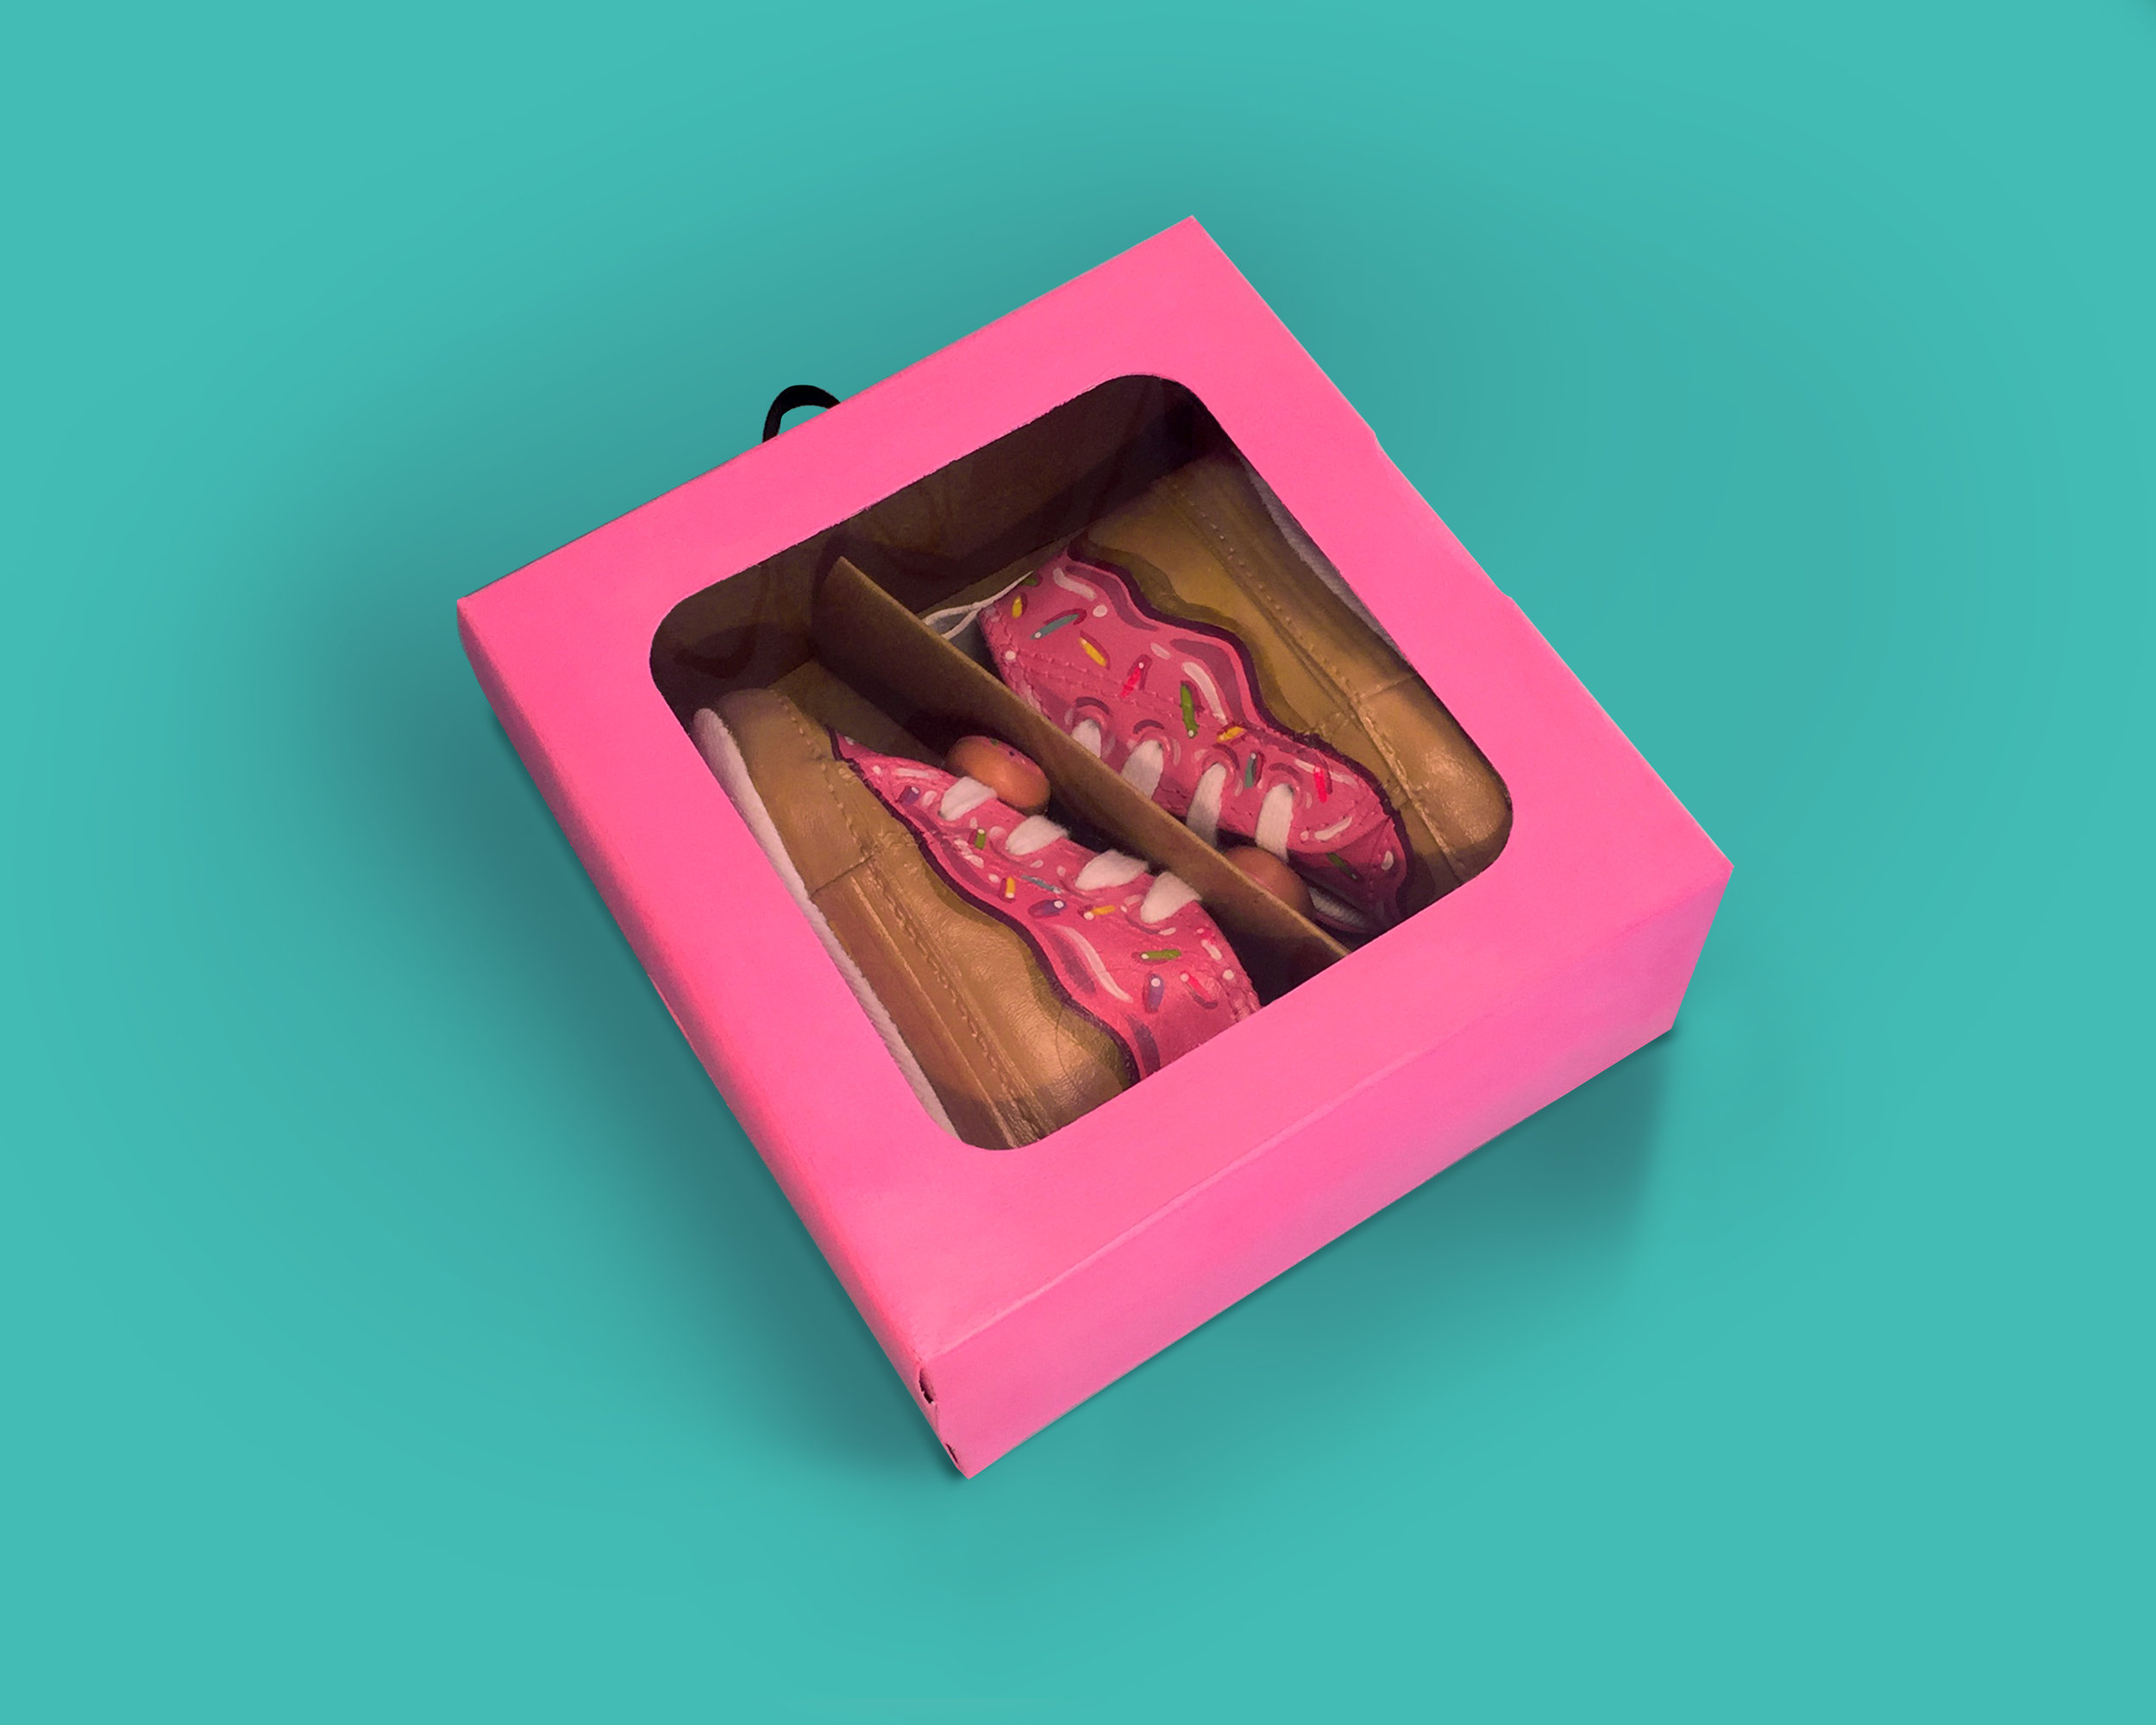 pinkbox.jpg